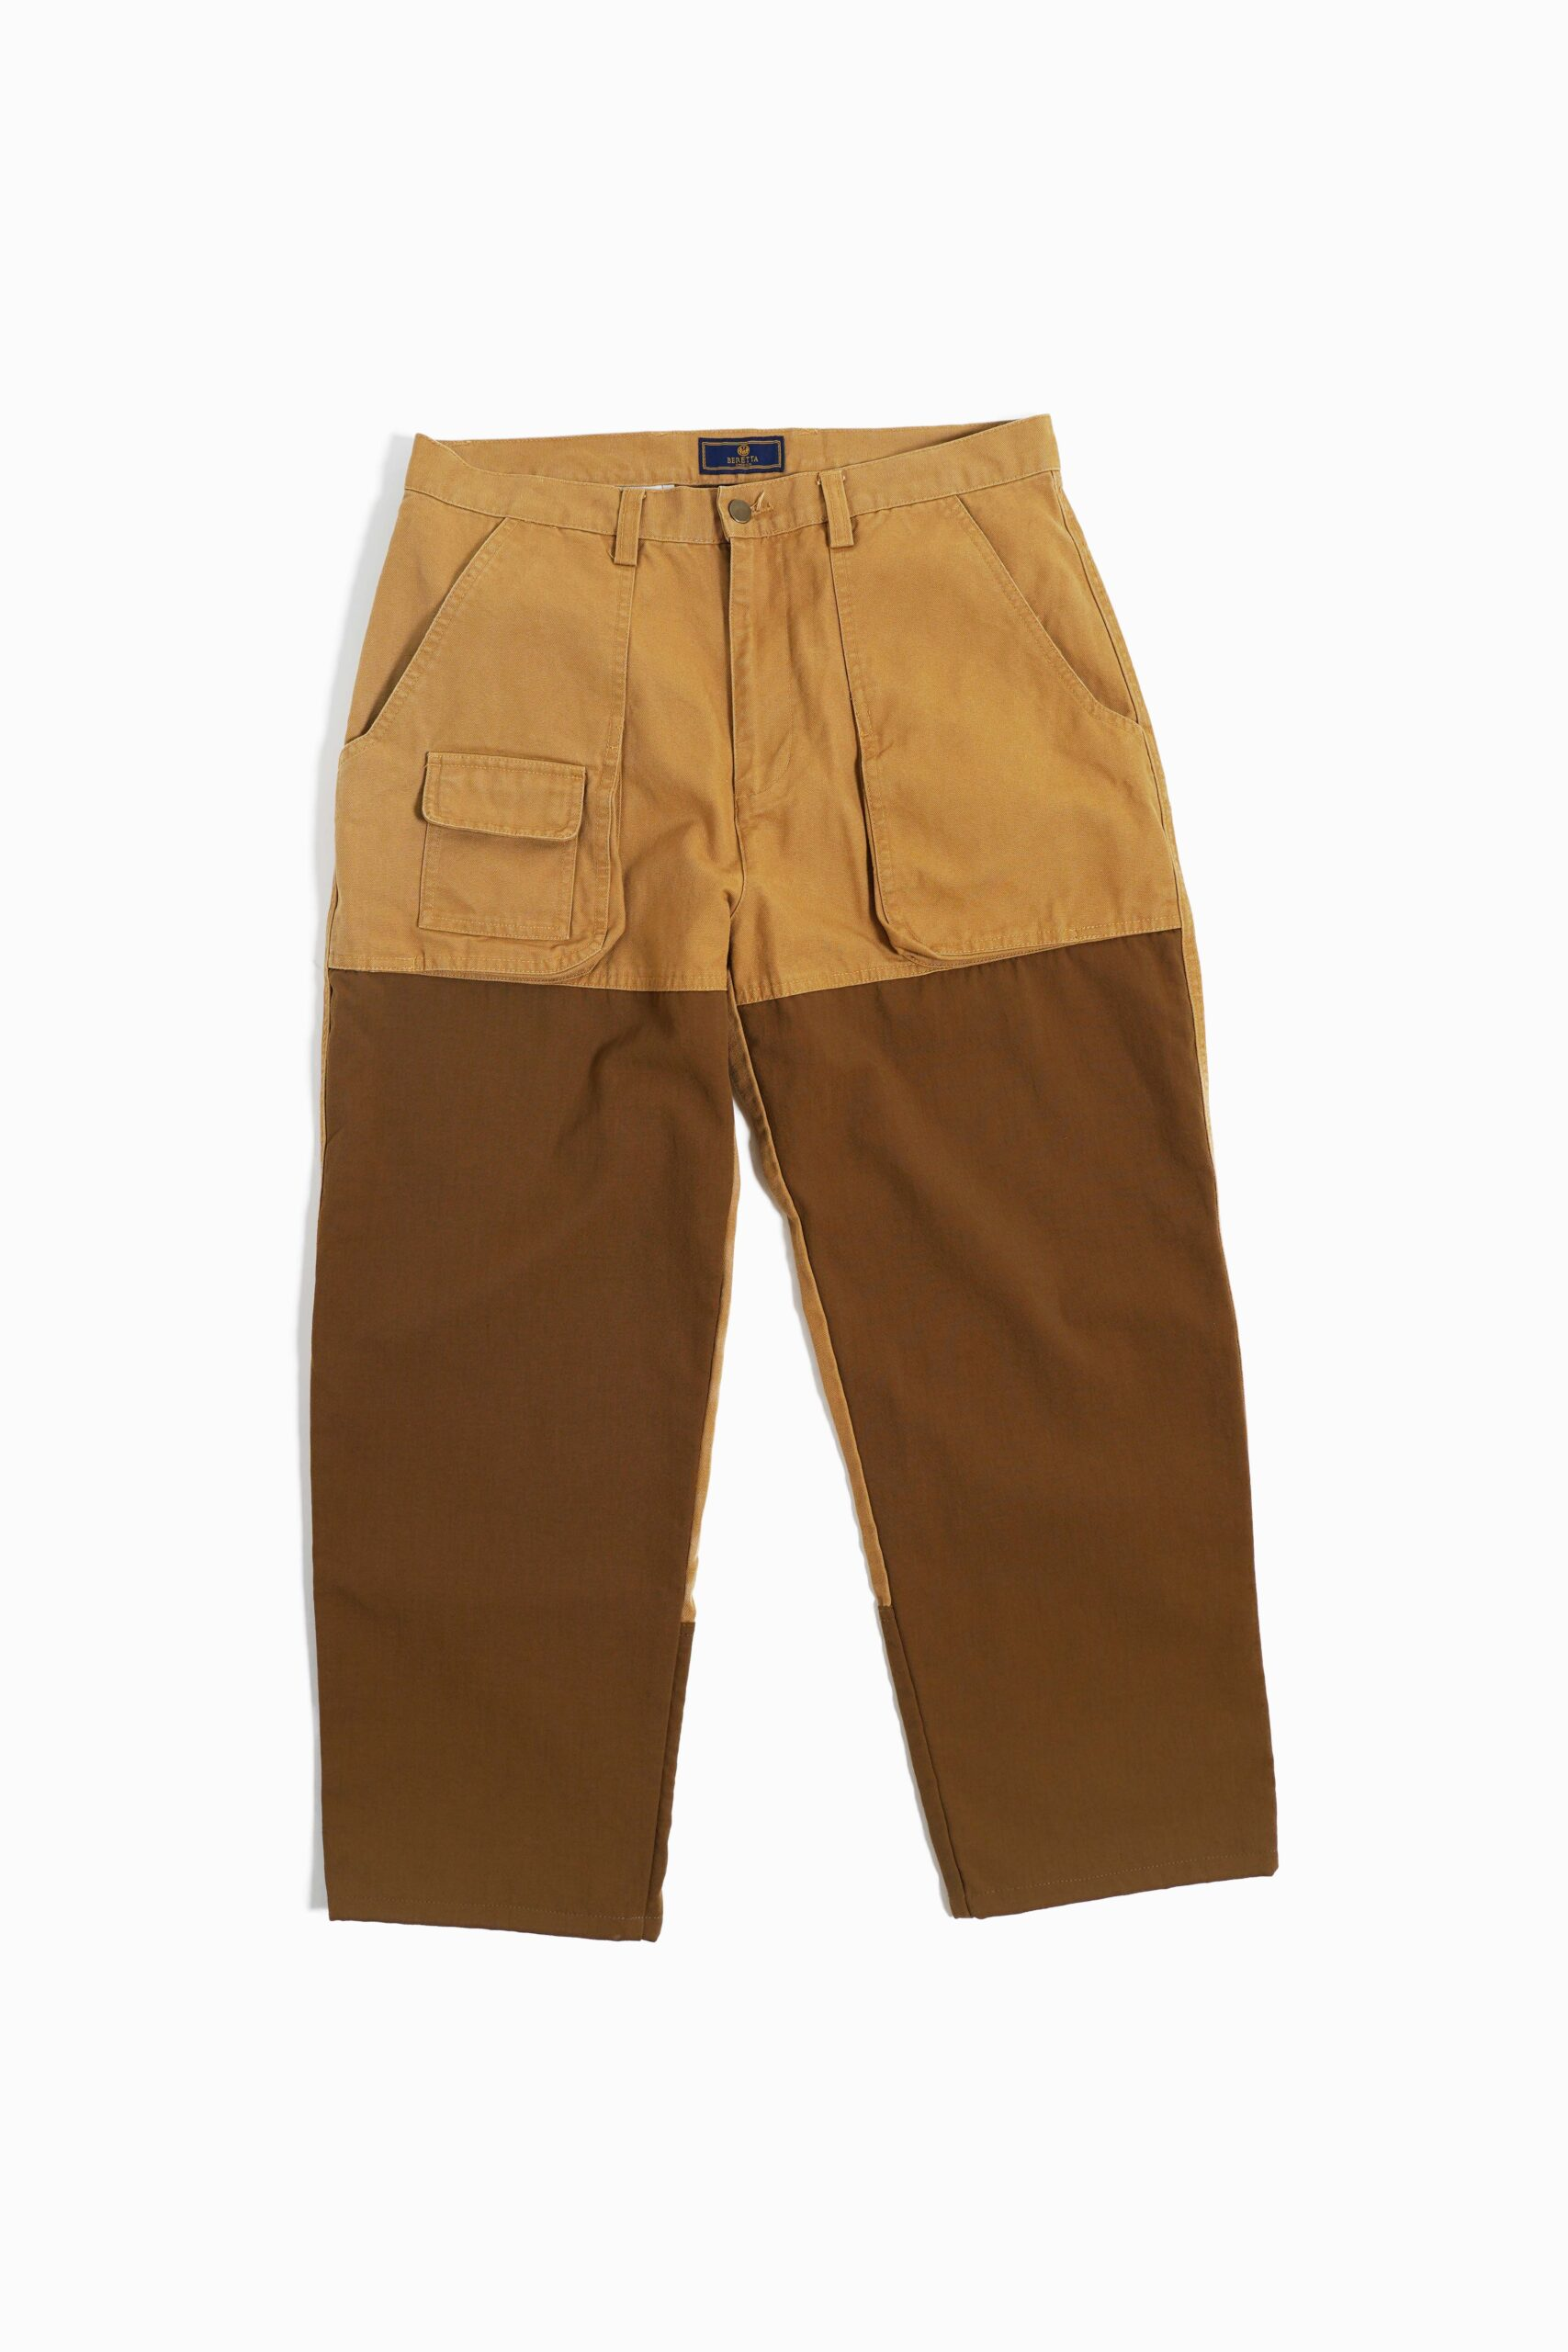 BROWN 2TONE COLOR UTILITY DENIM PANTS